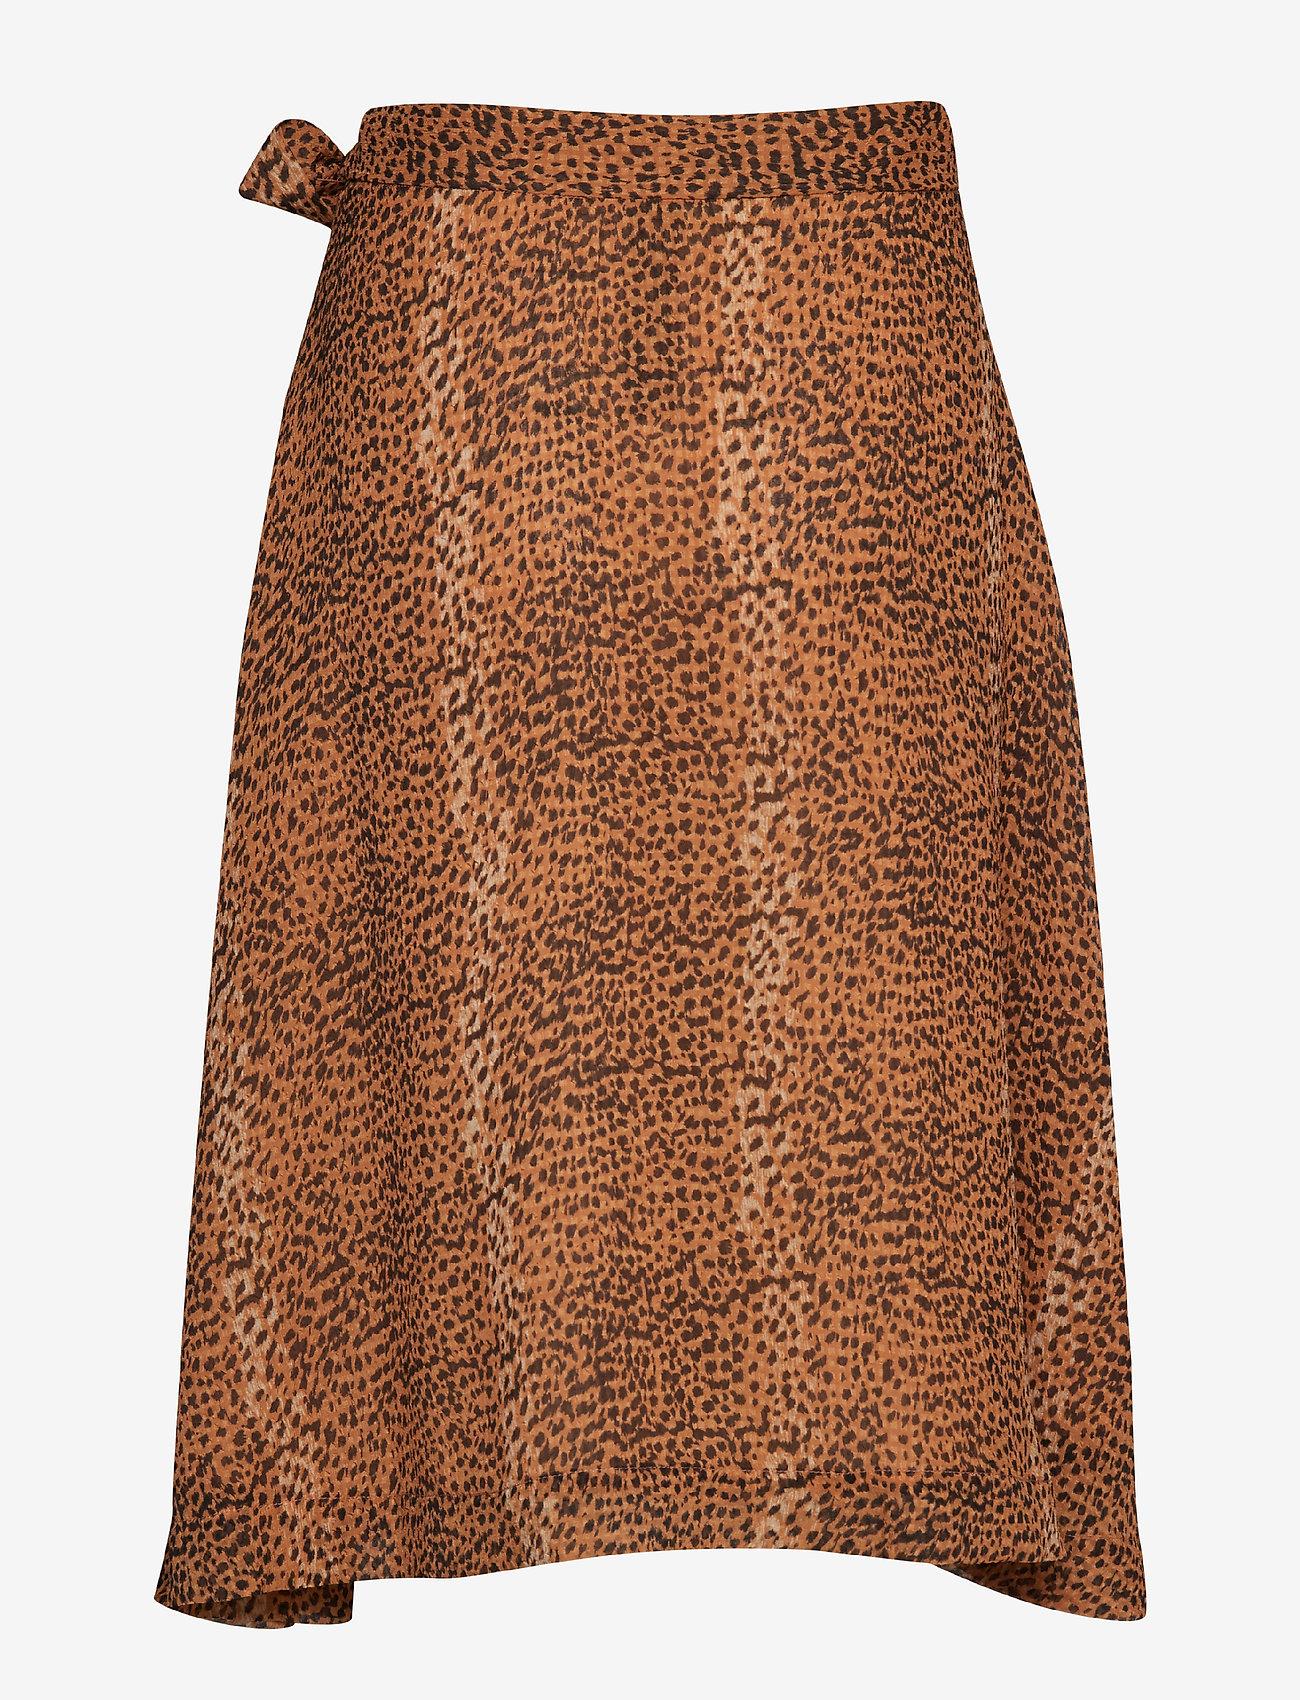 Tanyaiw Skirt (Light Brown Animal) (660 kr) - InWear